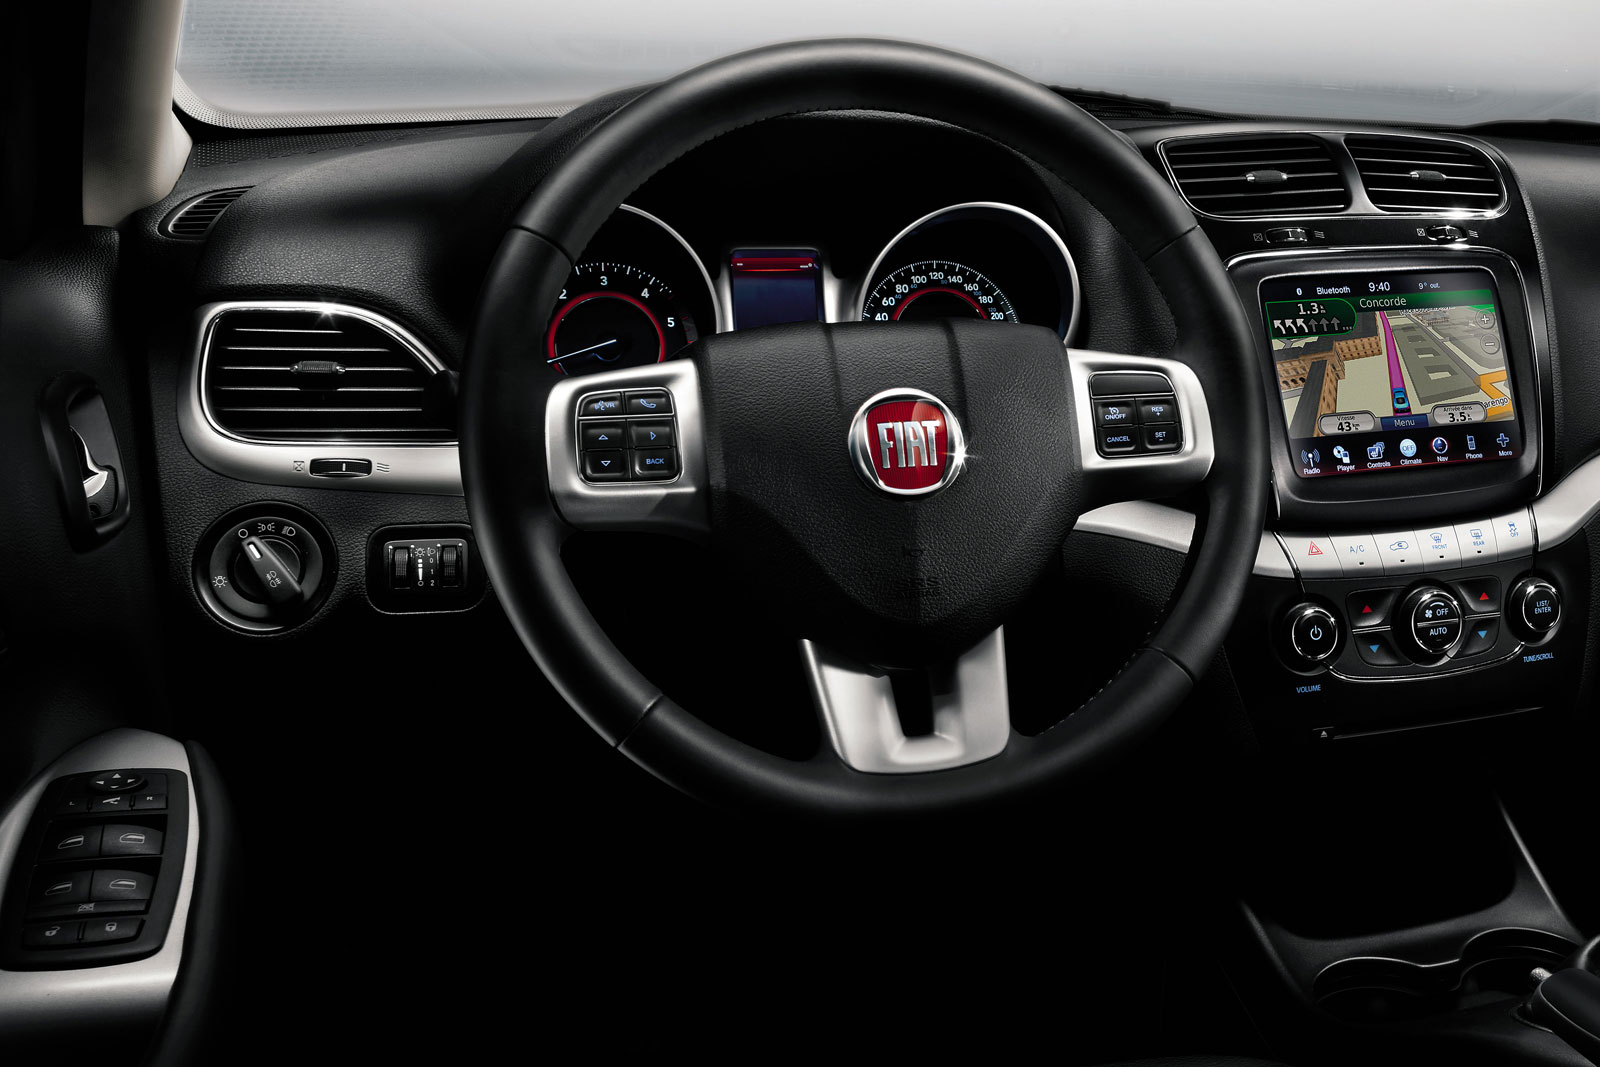 FIAT FREEMONT interior